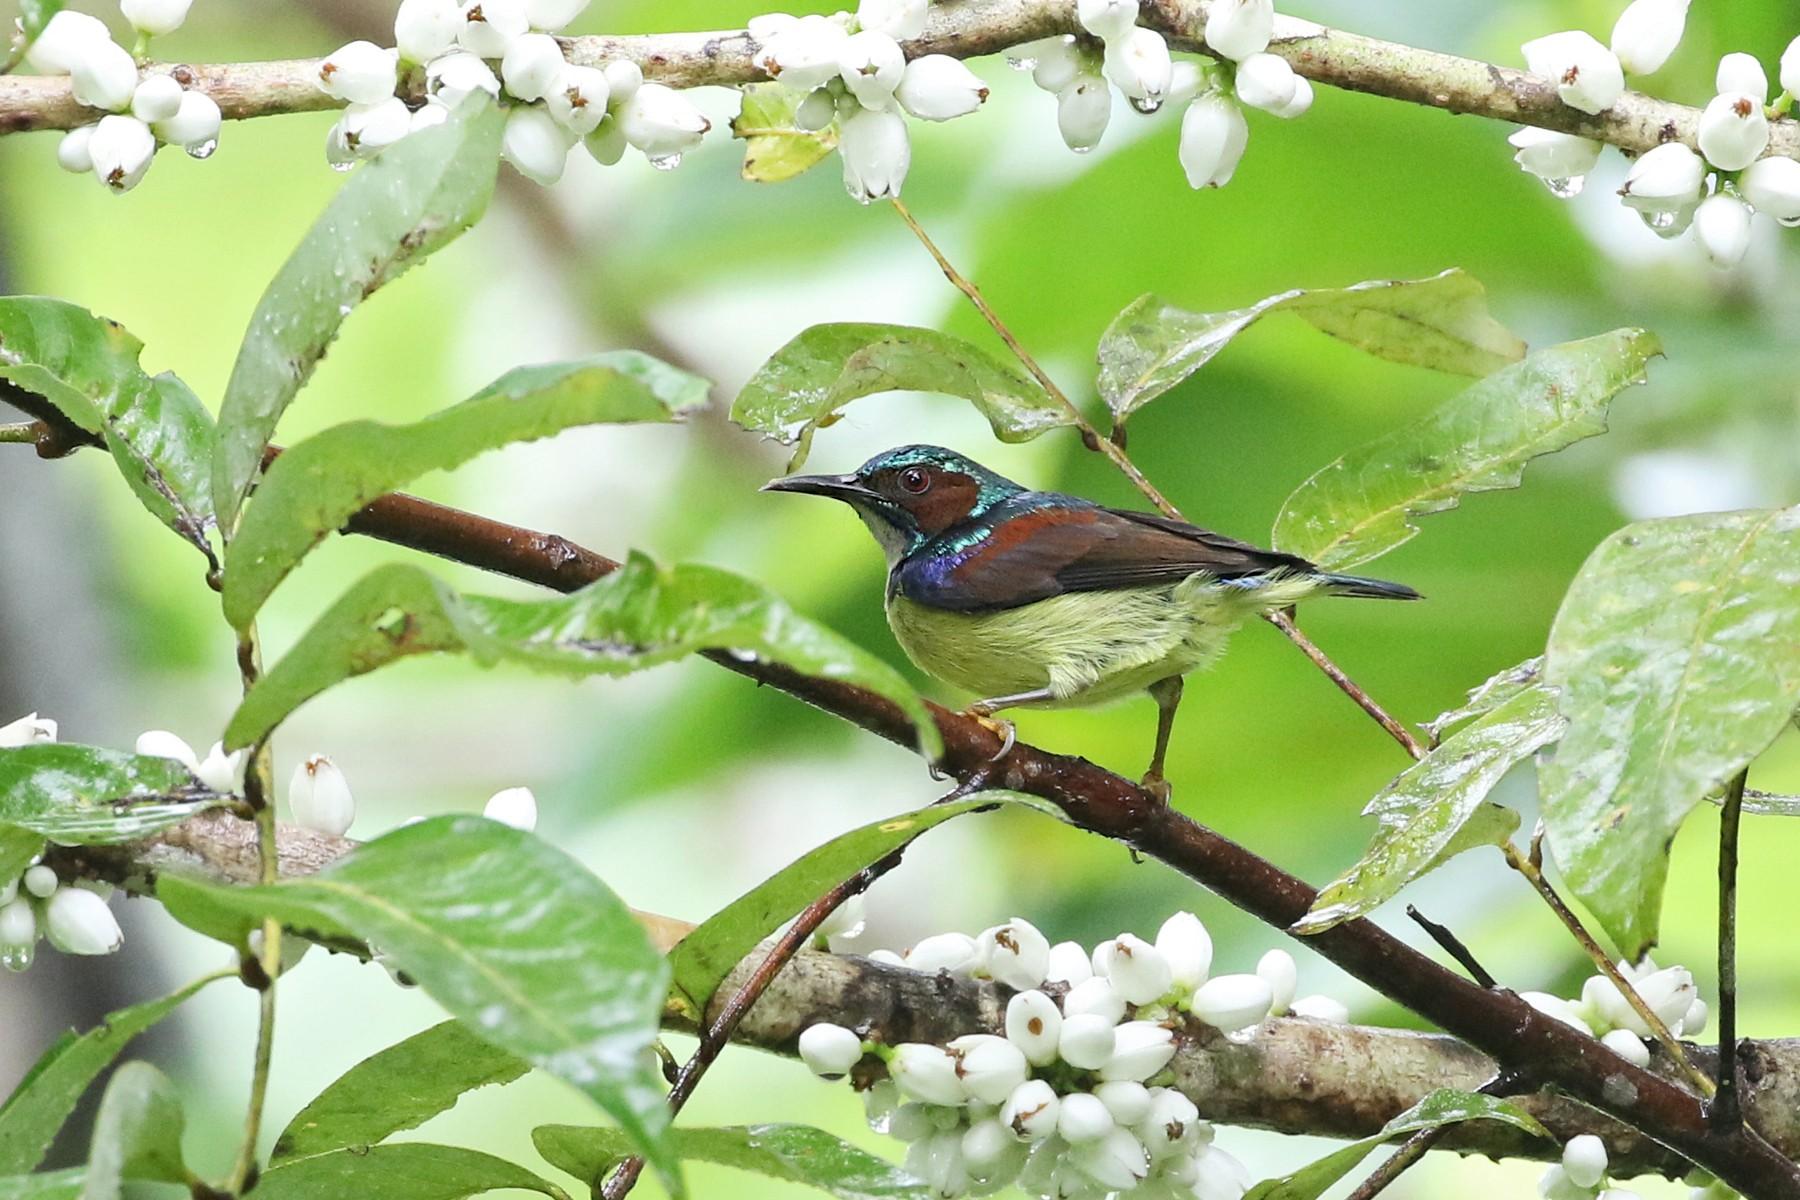 Gray-throated Sunbird - Charley Hesse TROPICAL BIRDING